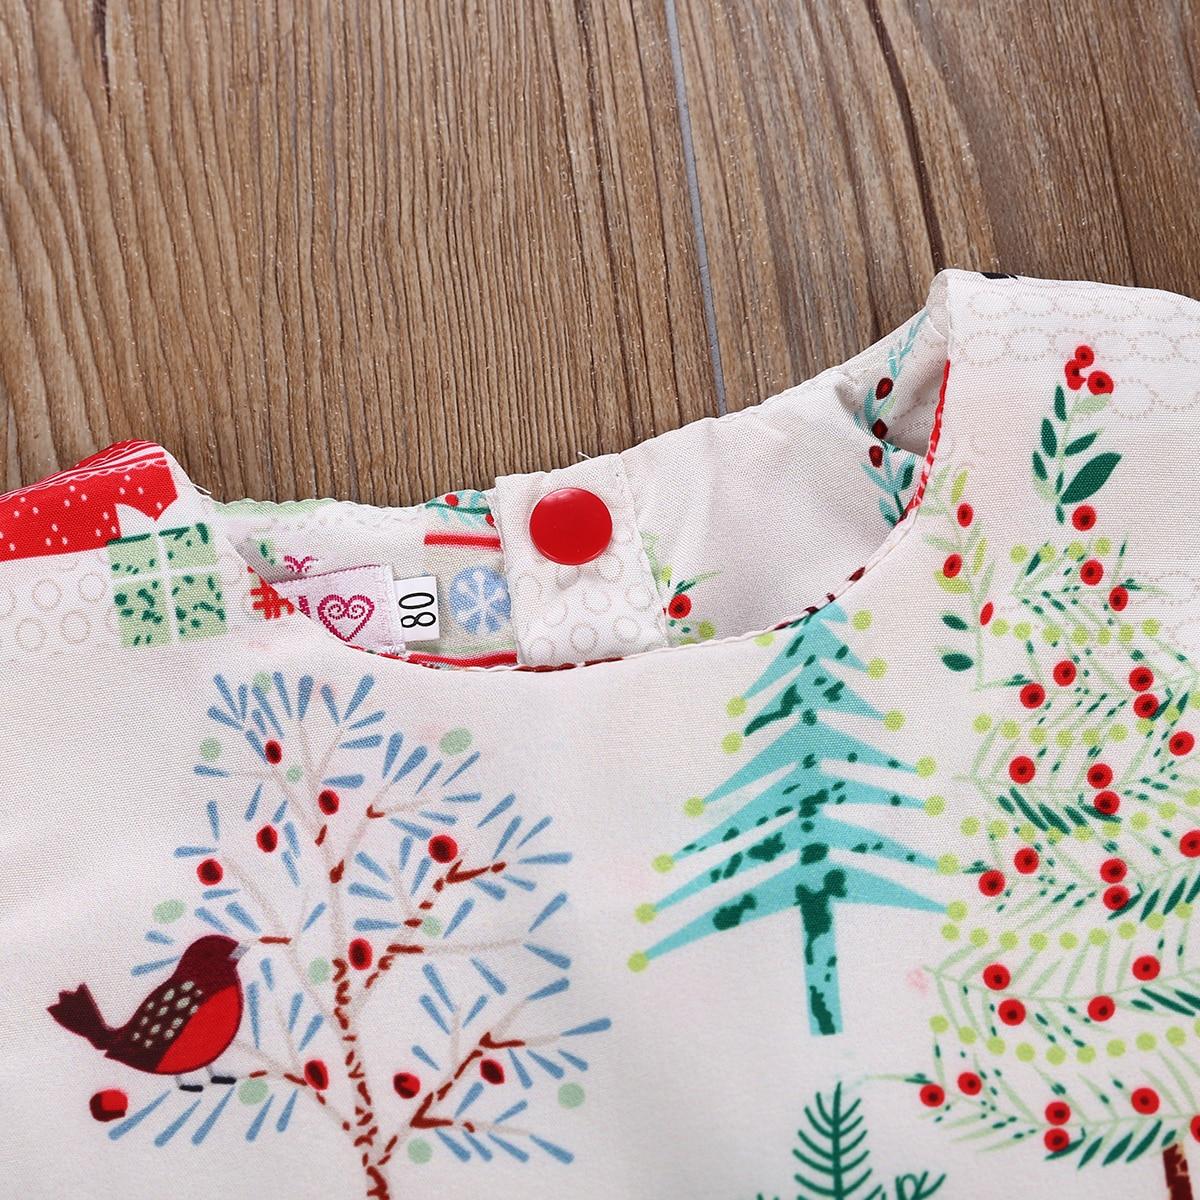 2586e69fd 2-6 Years Xmas Toddler Kid Baby Girl Christmas Cartoon Deer Sleeveless  Party Dress 1